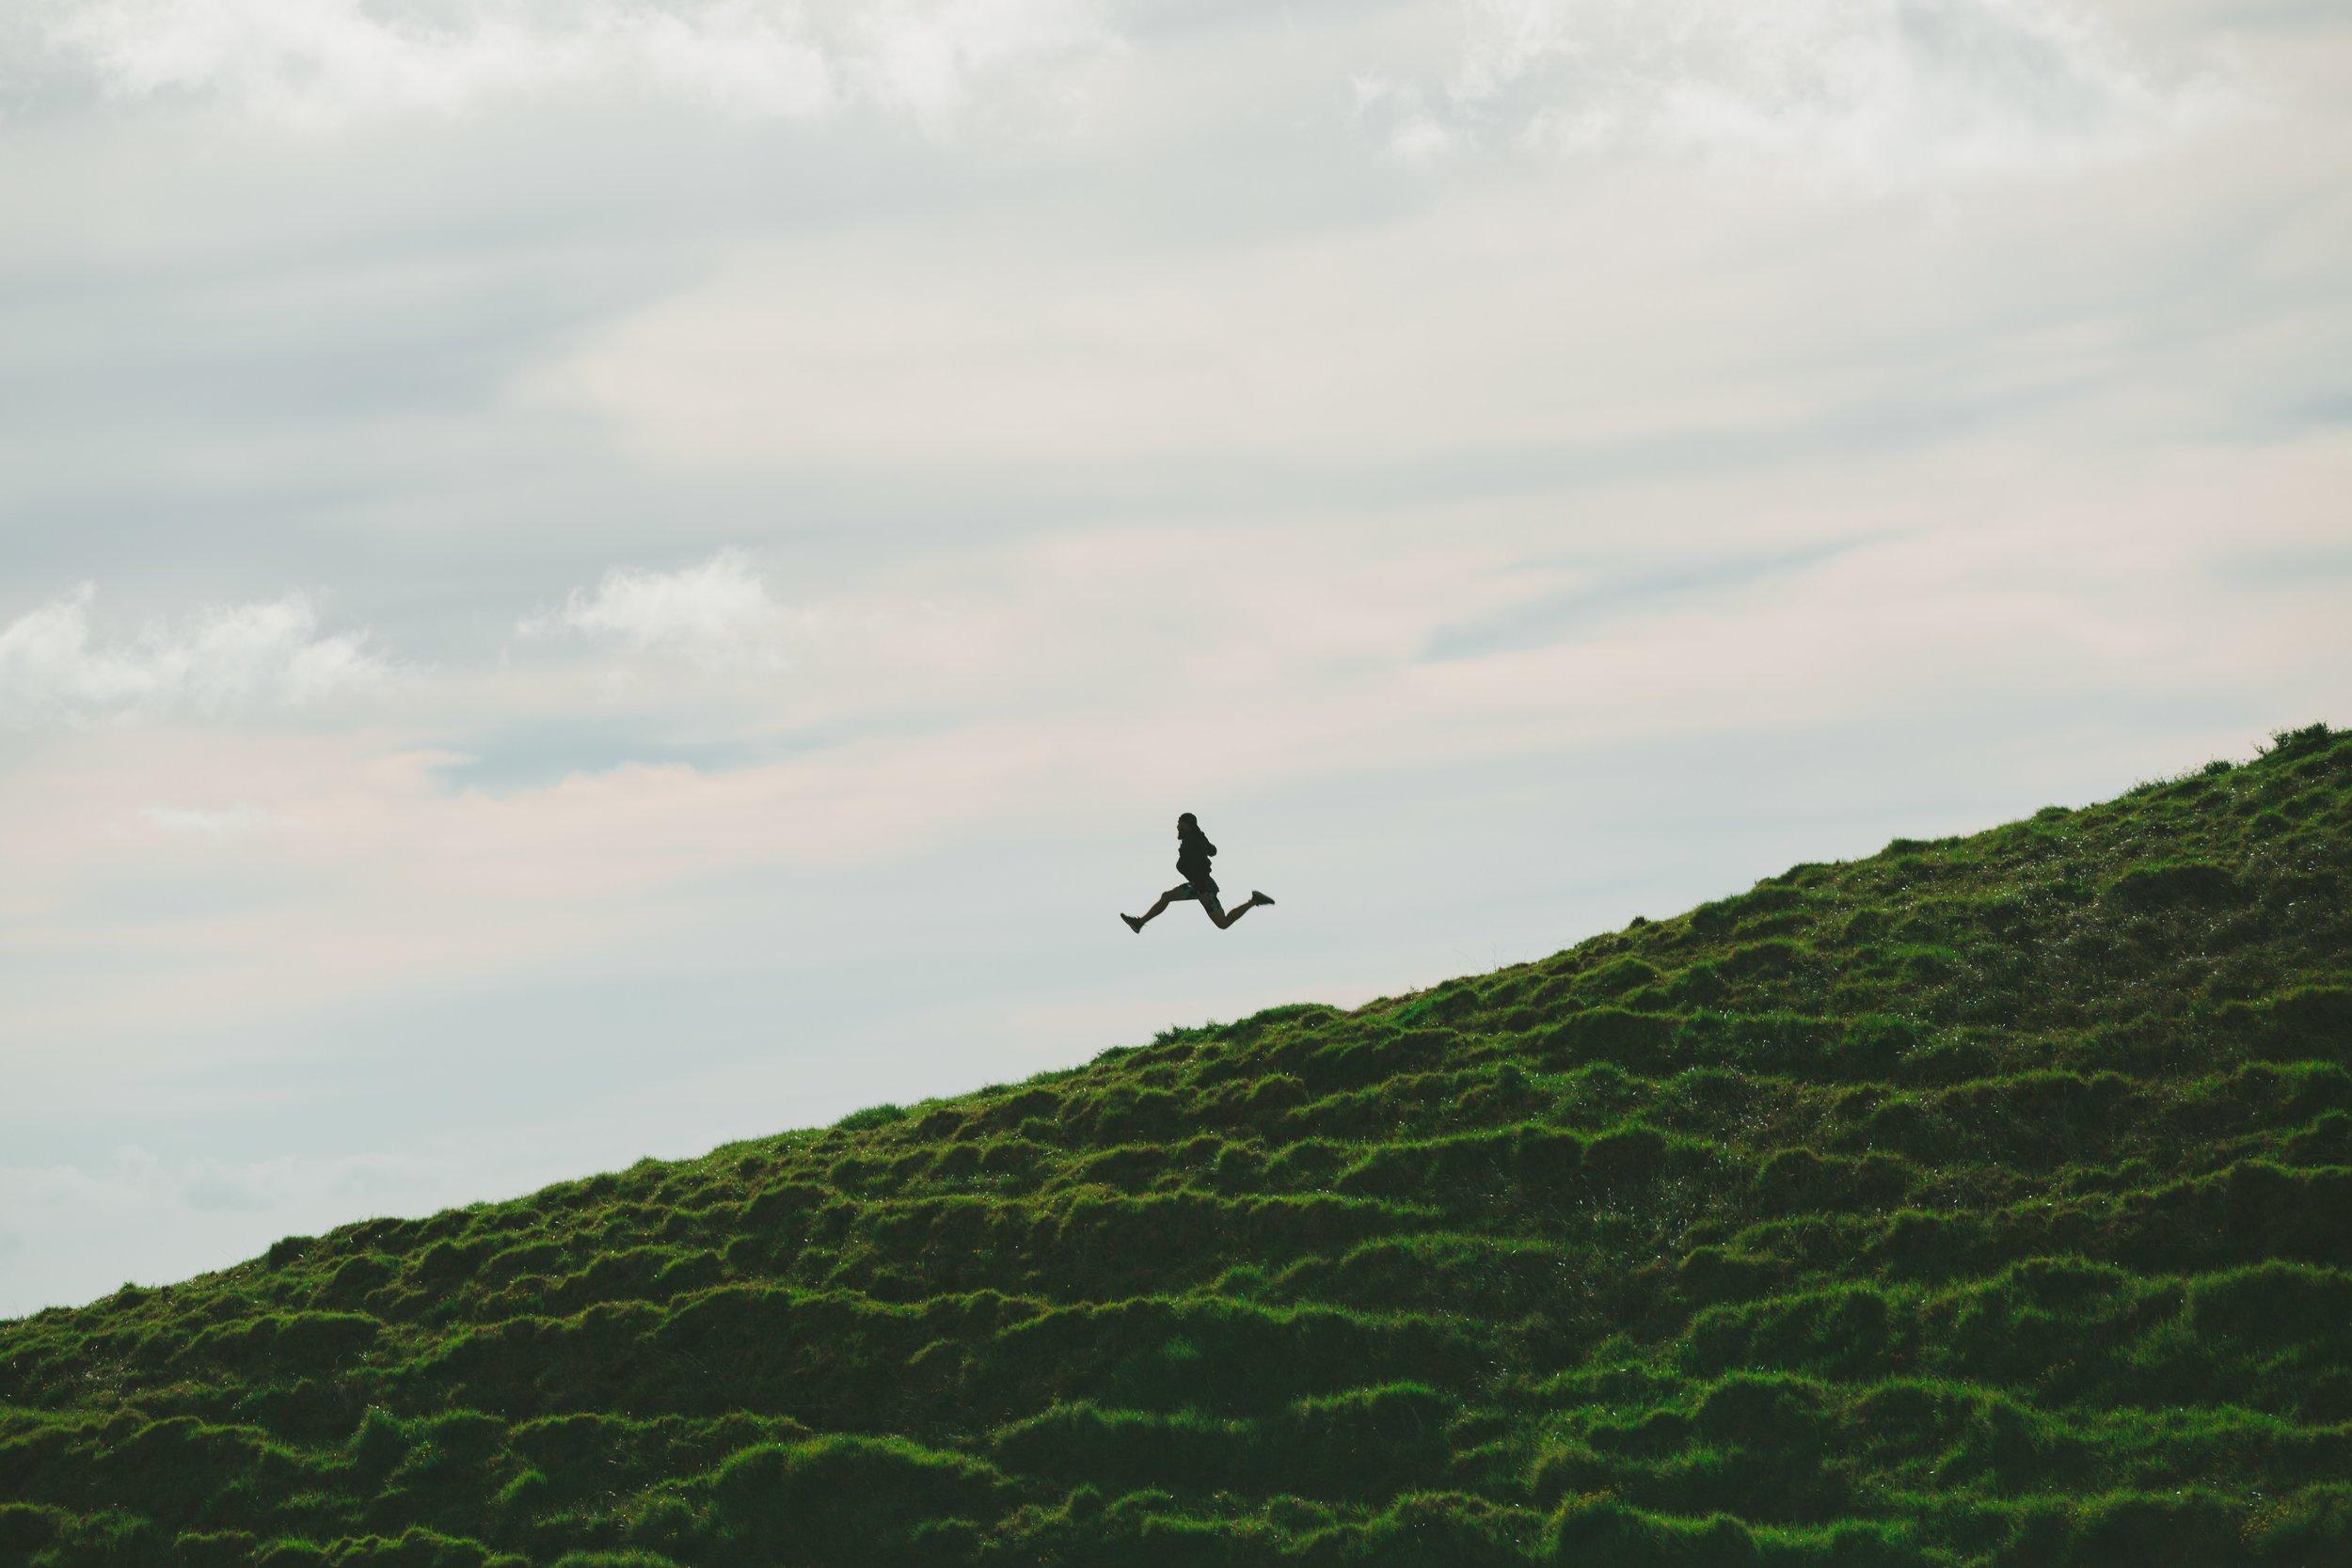 nutritionmistakes-endurancerunners-marathonrunner-healthandnutrition.jpg